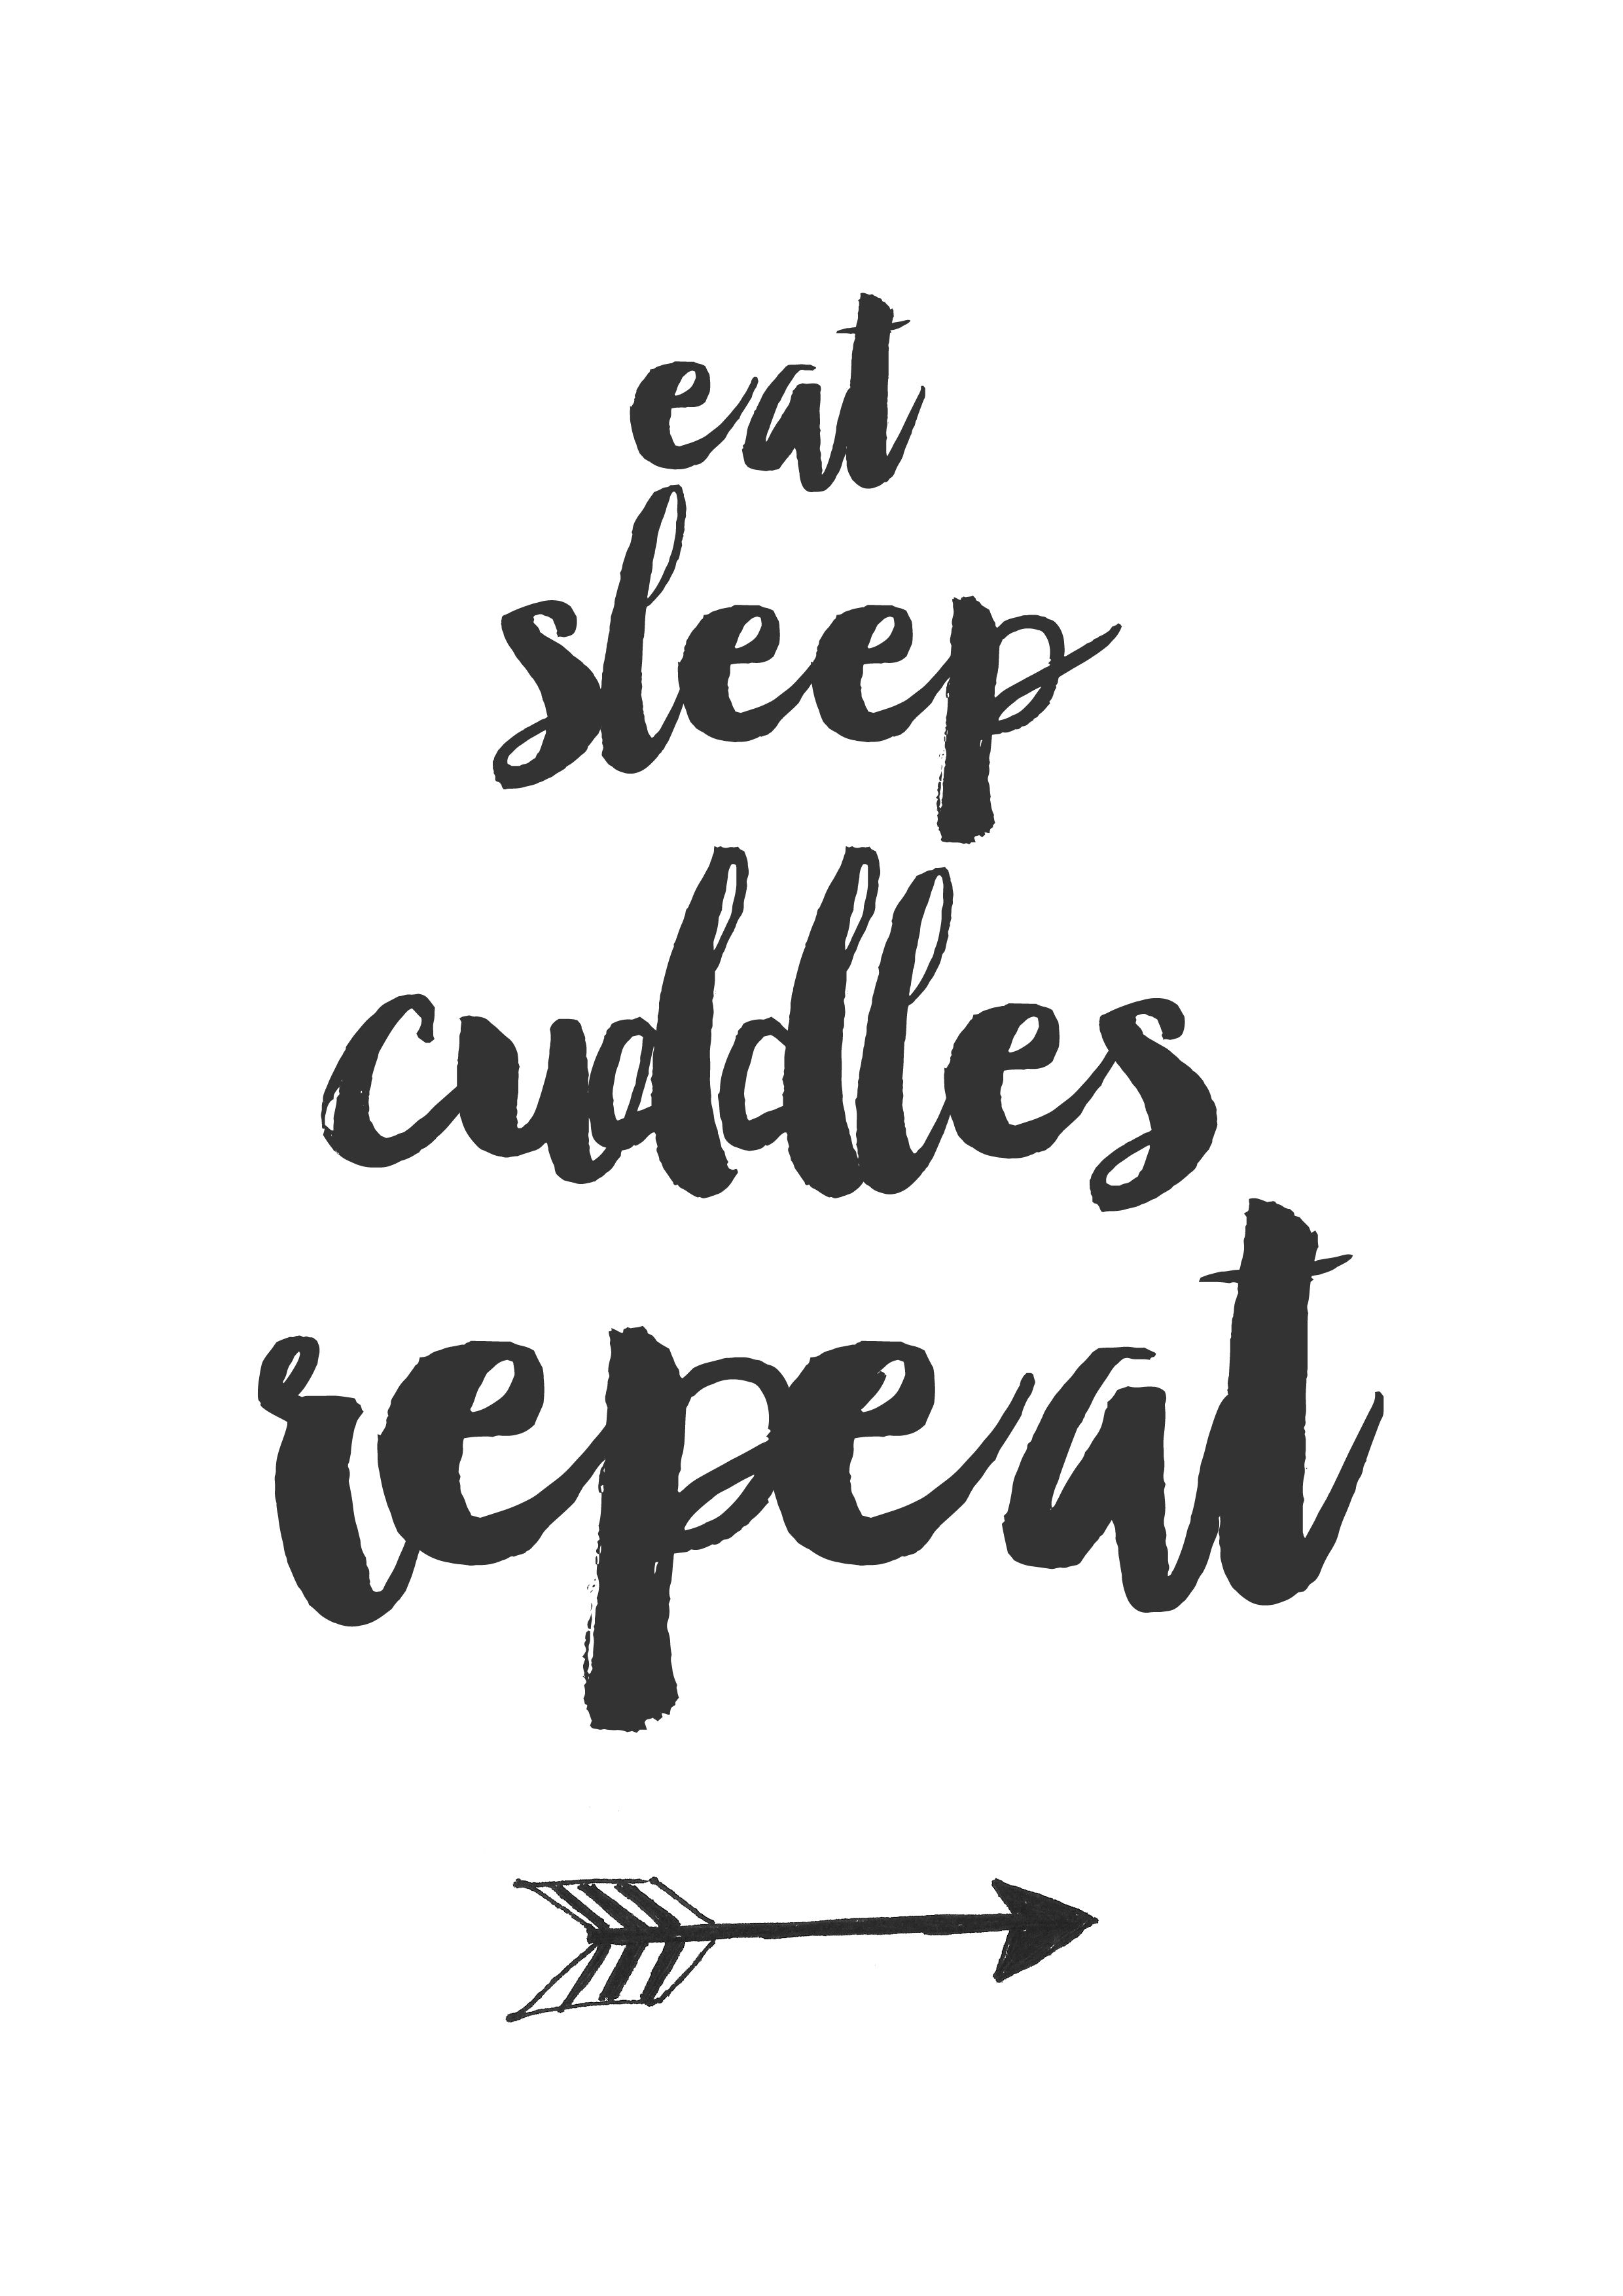 Eat Sleep Cuddles Repeat